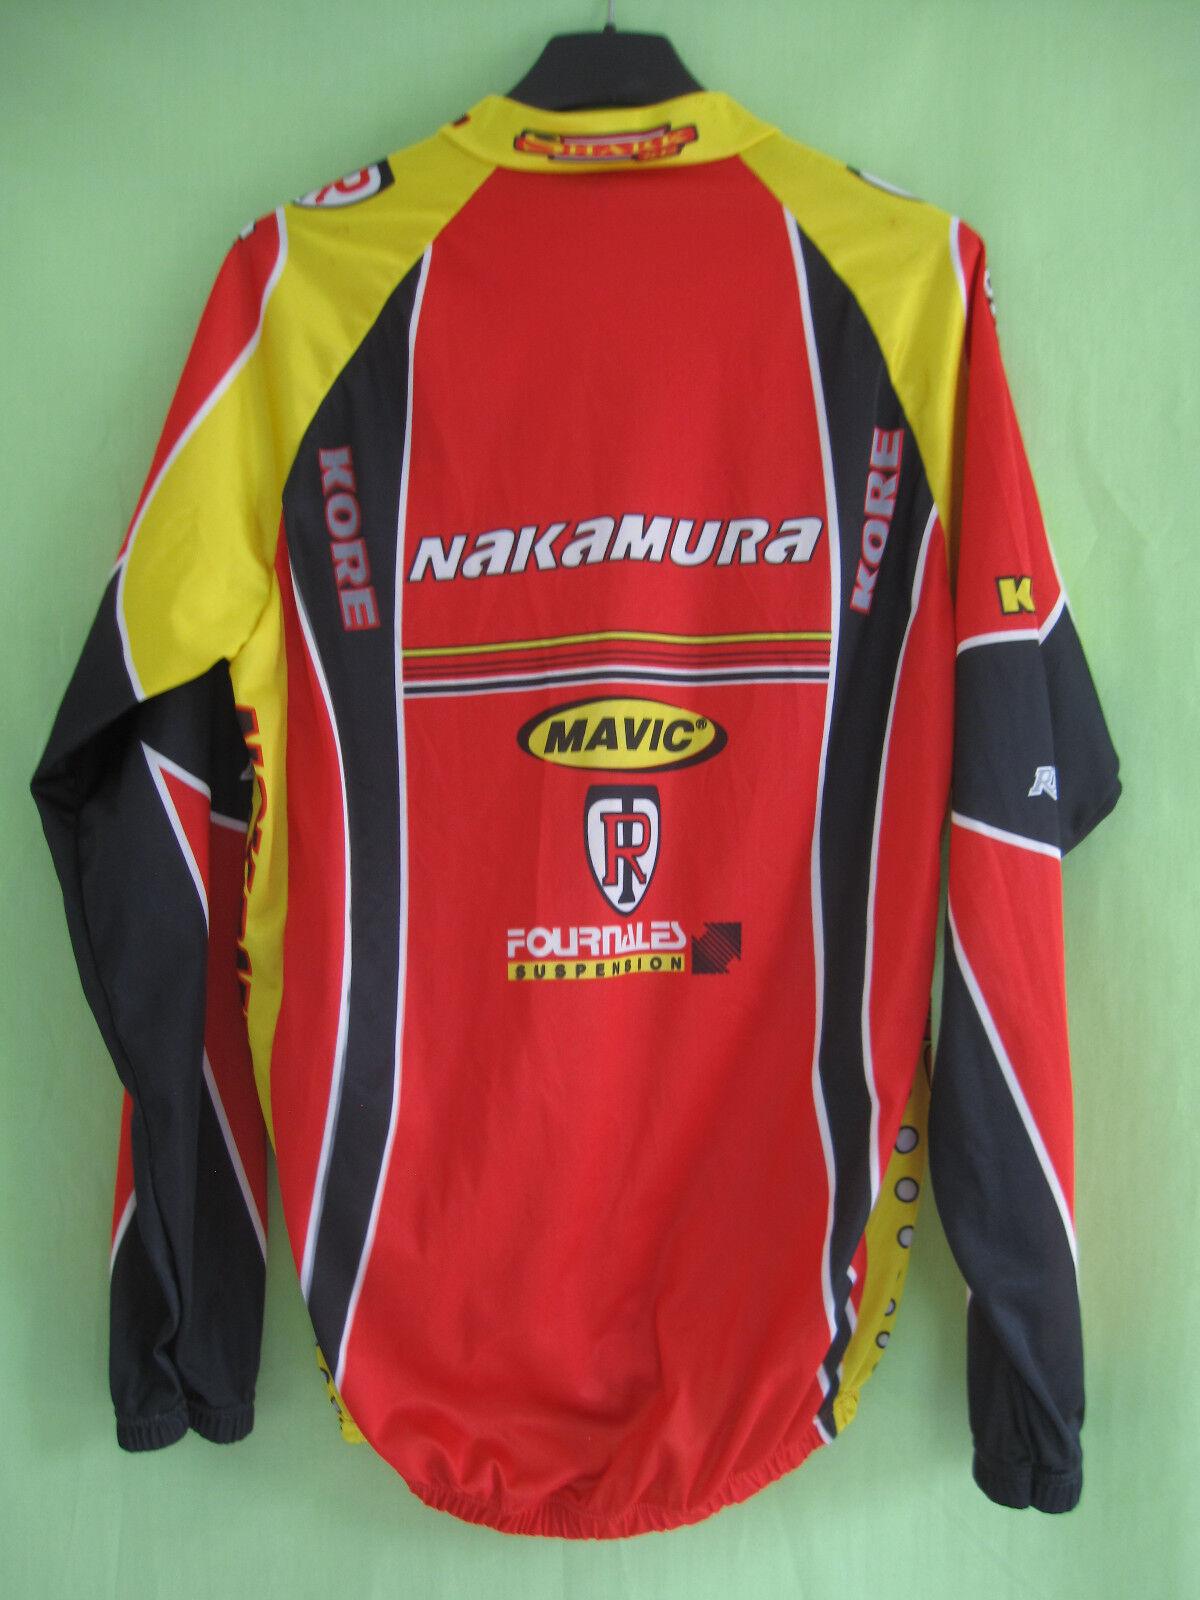 Veste cycliste Nakamura Team Hutchinson Coupe vent stop Mavic Wind Mavic stop Vintage - S fb9f09